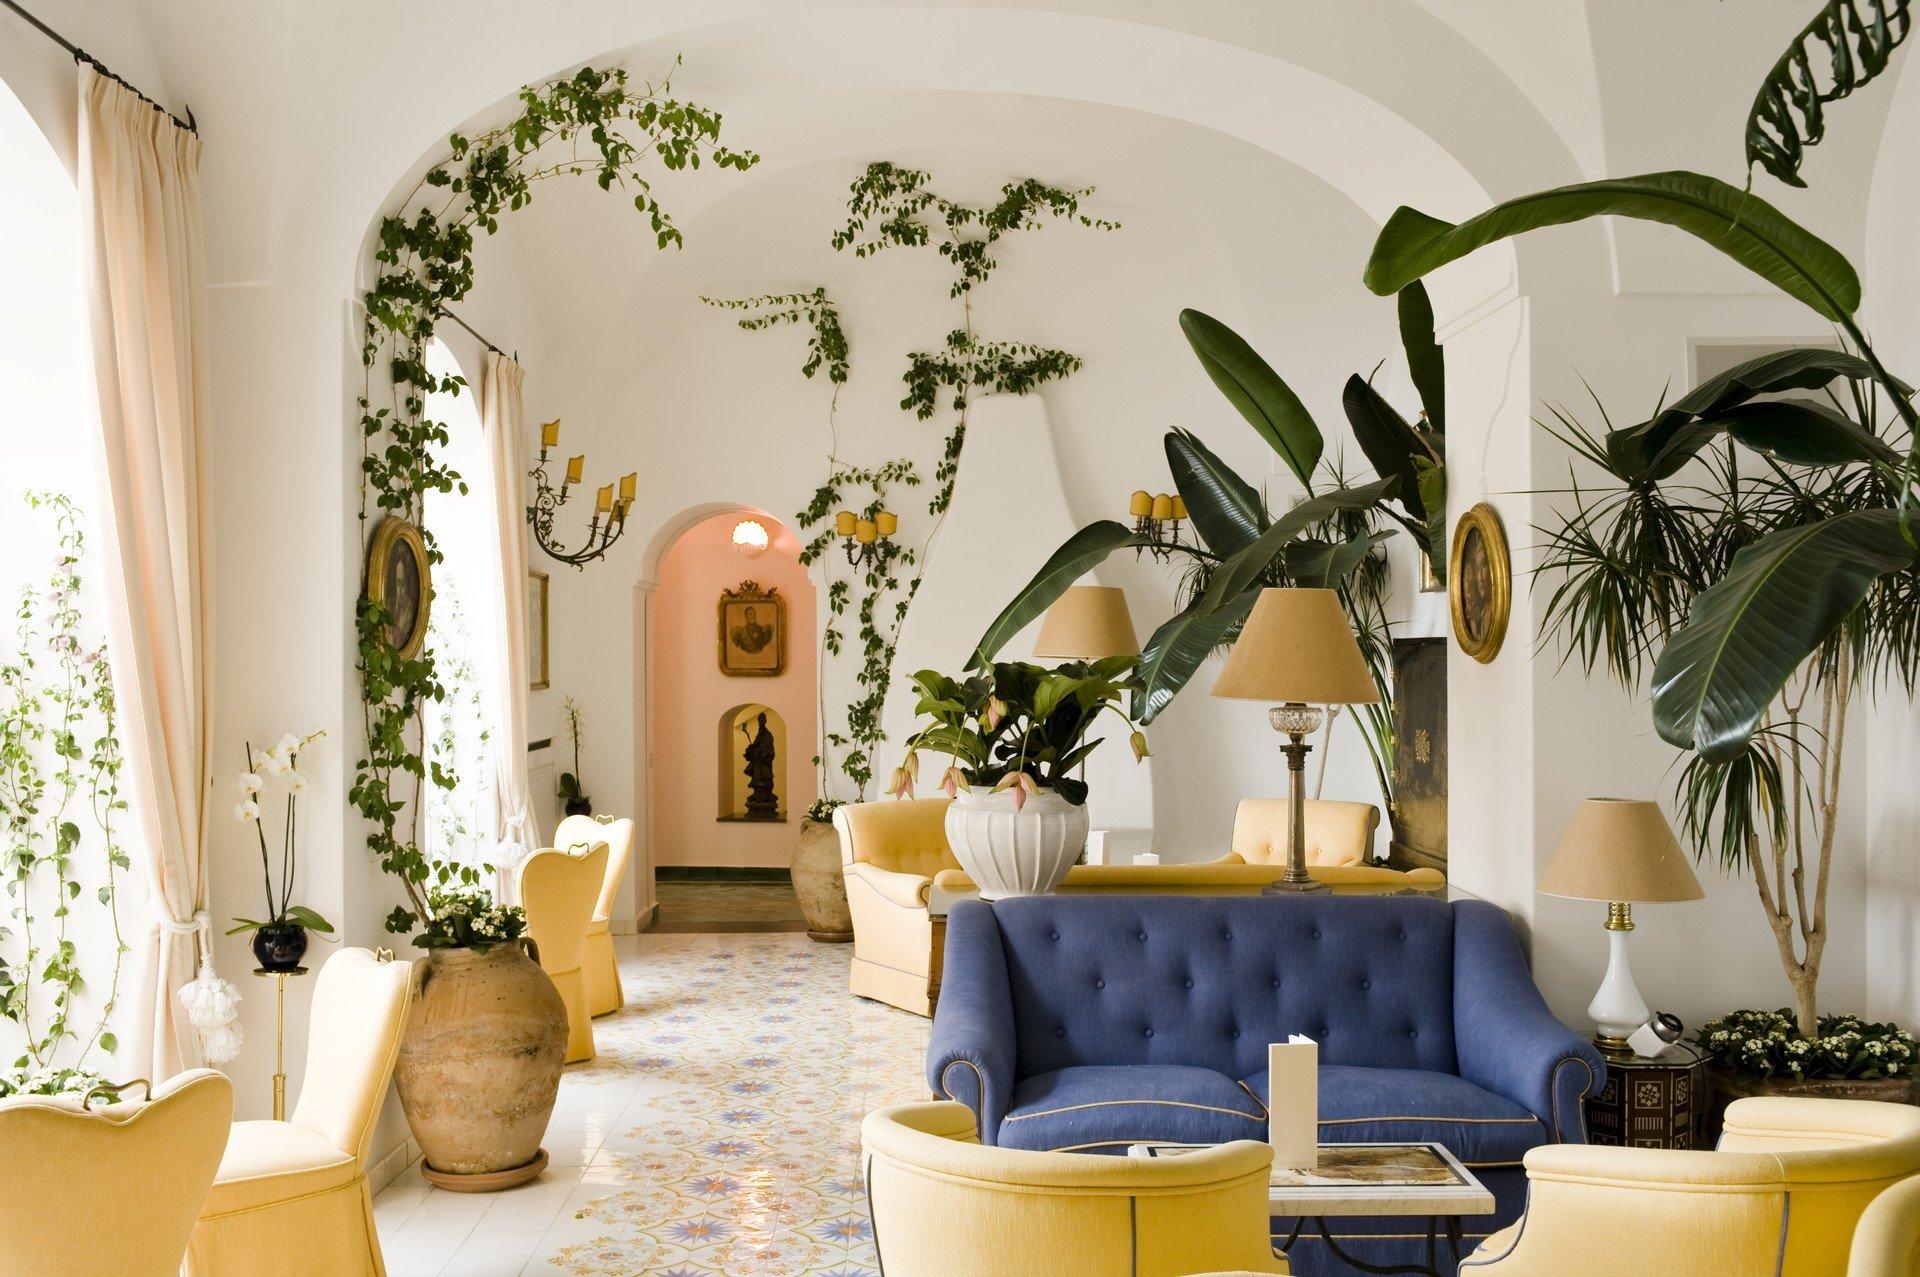 Hotels Romance wall indoor Living room living room plant furniture home interior design floristry estate Design decorated sofa